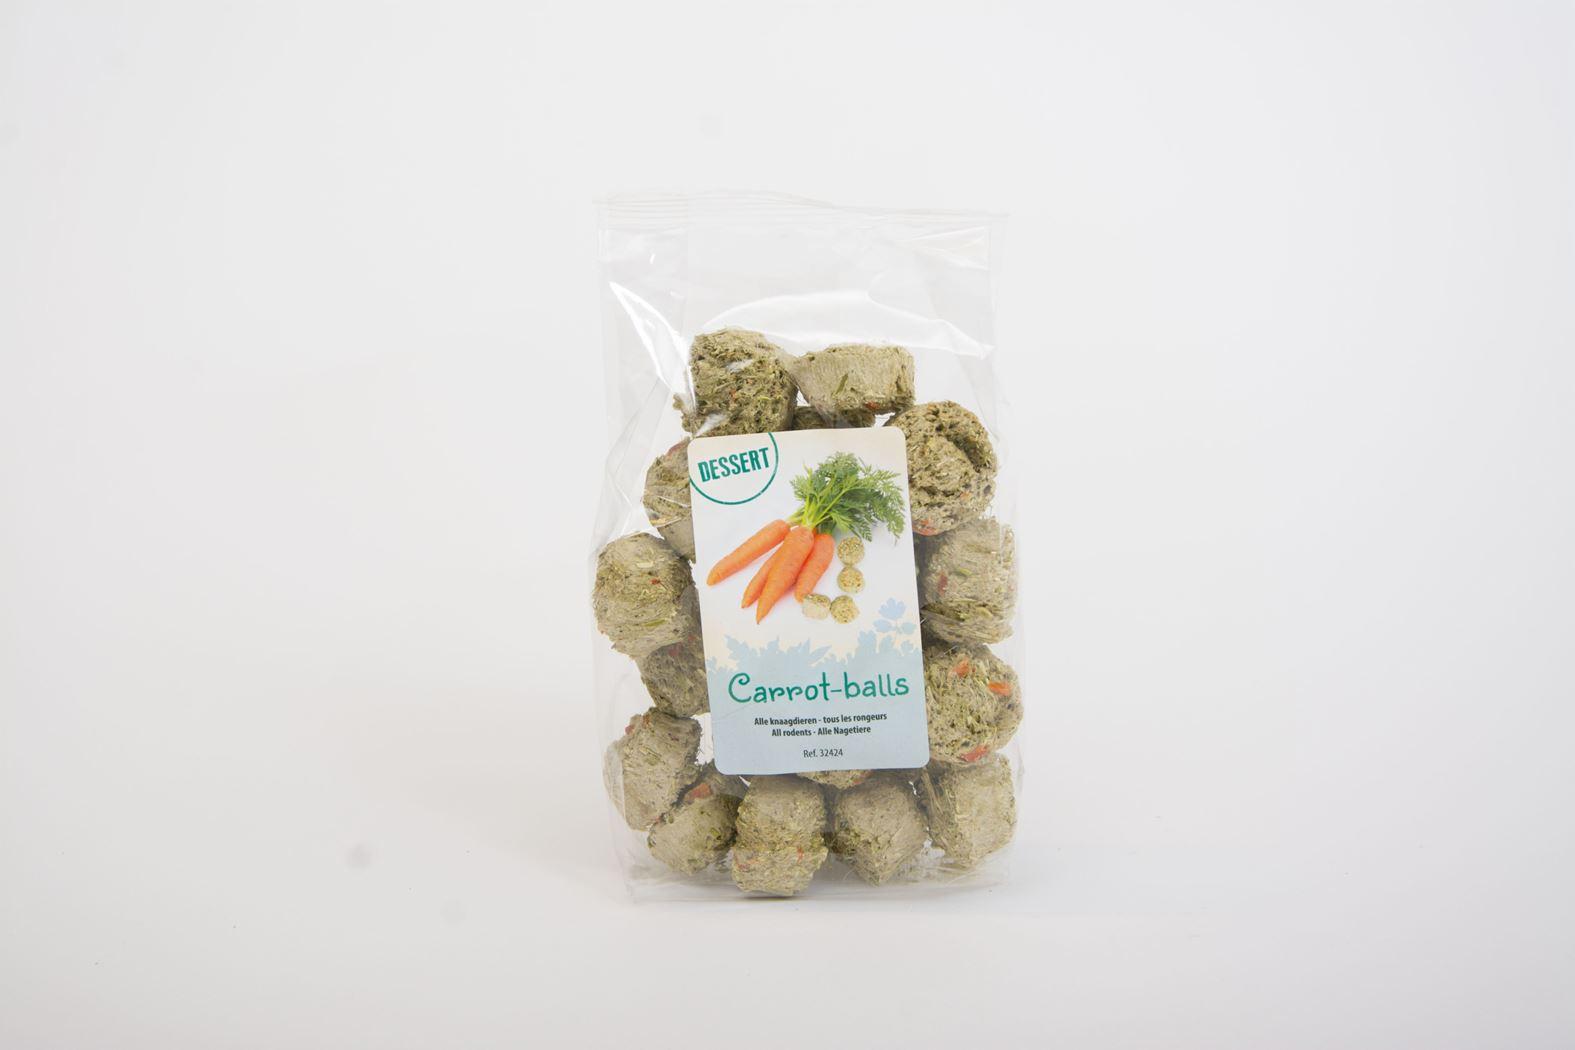 benelux dessert carrot-balls